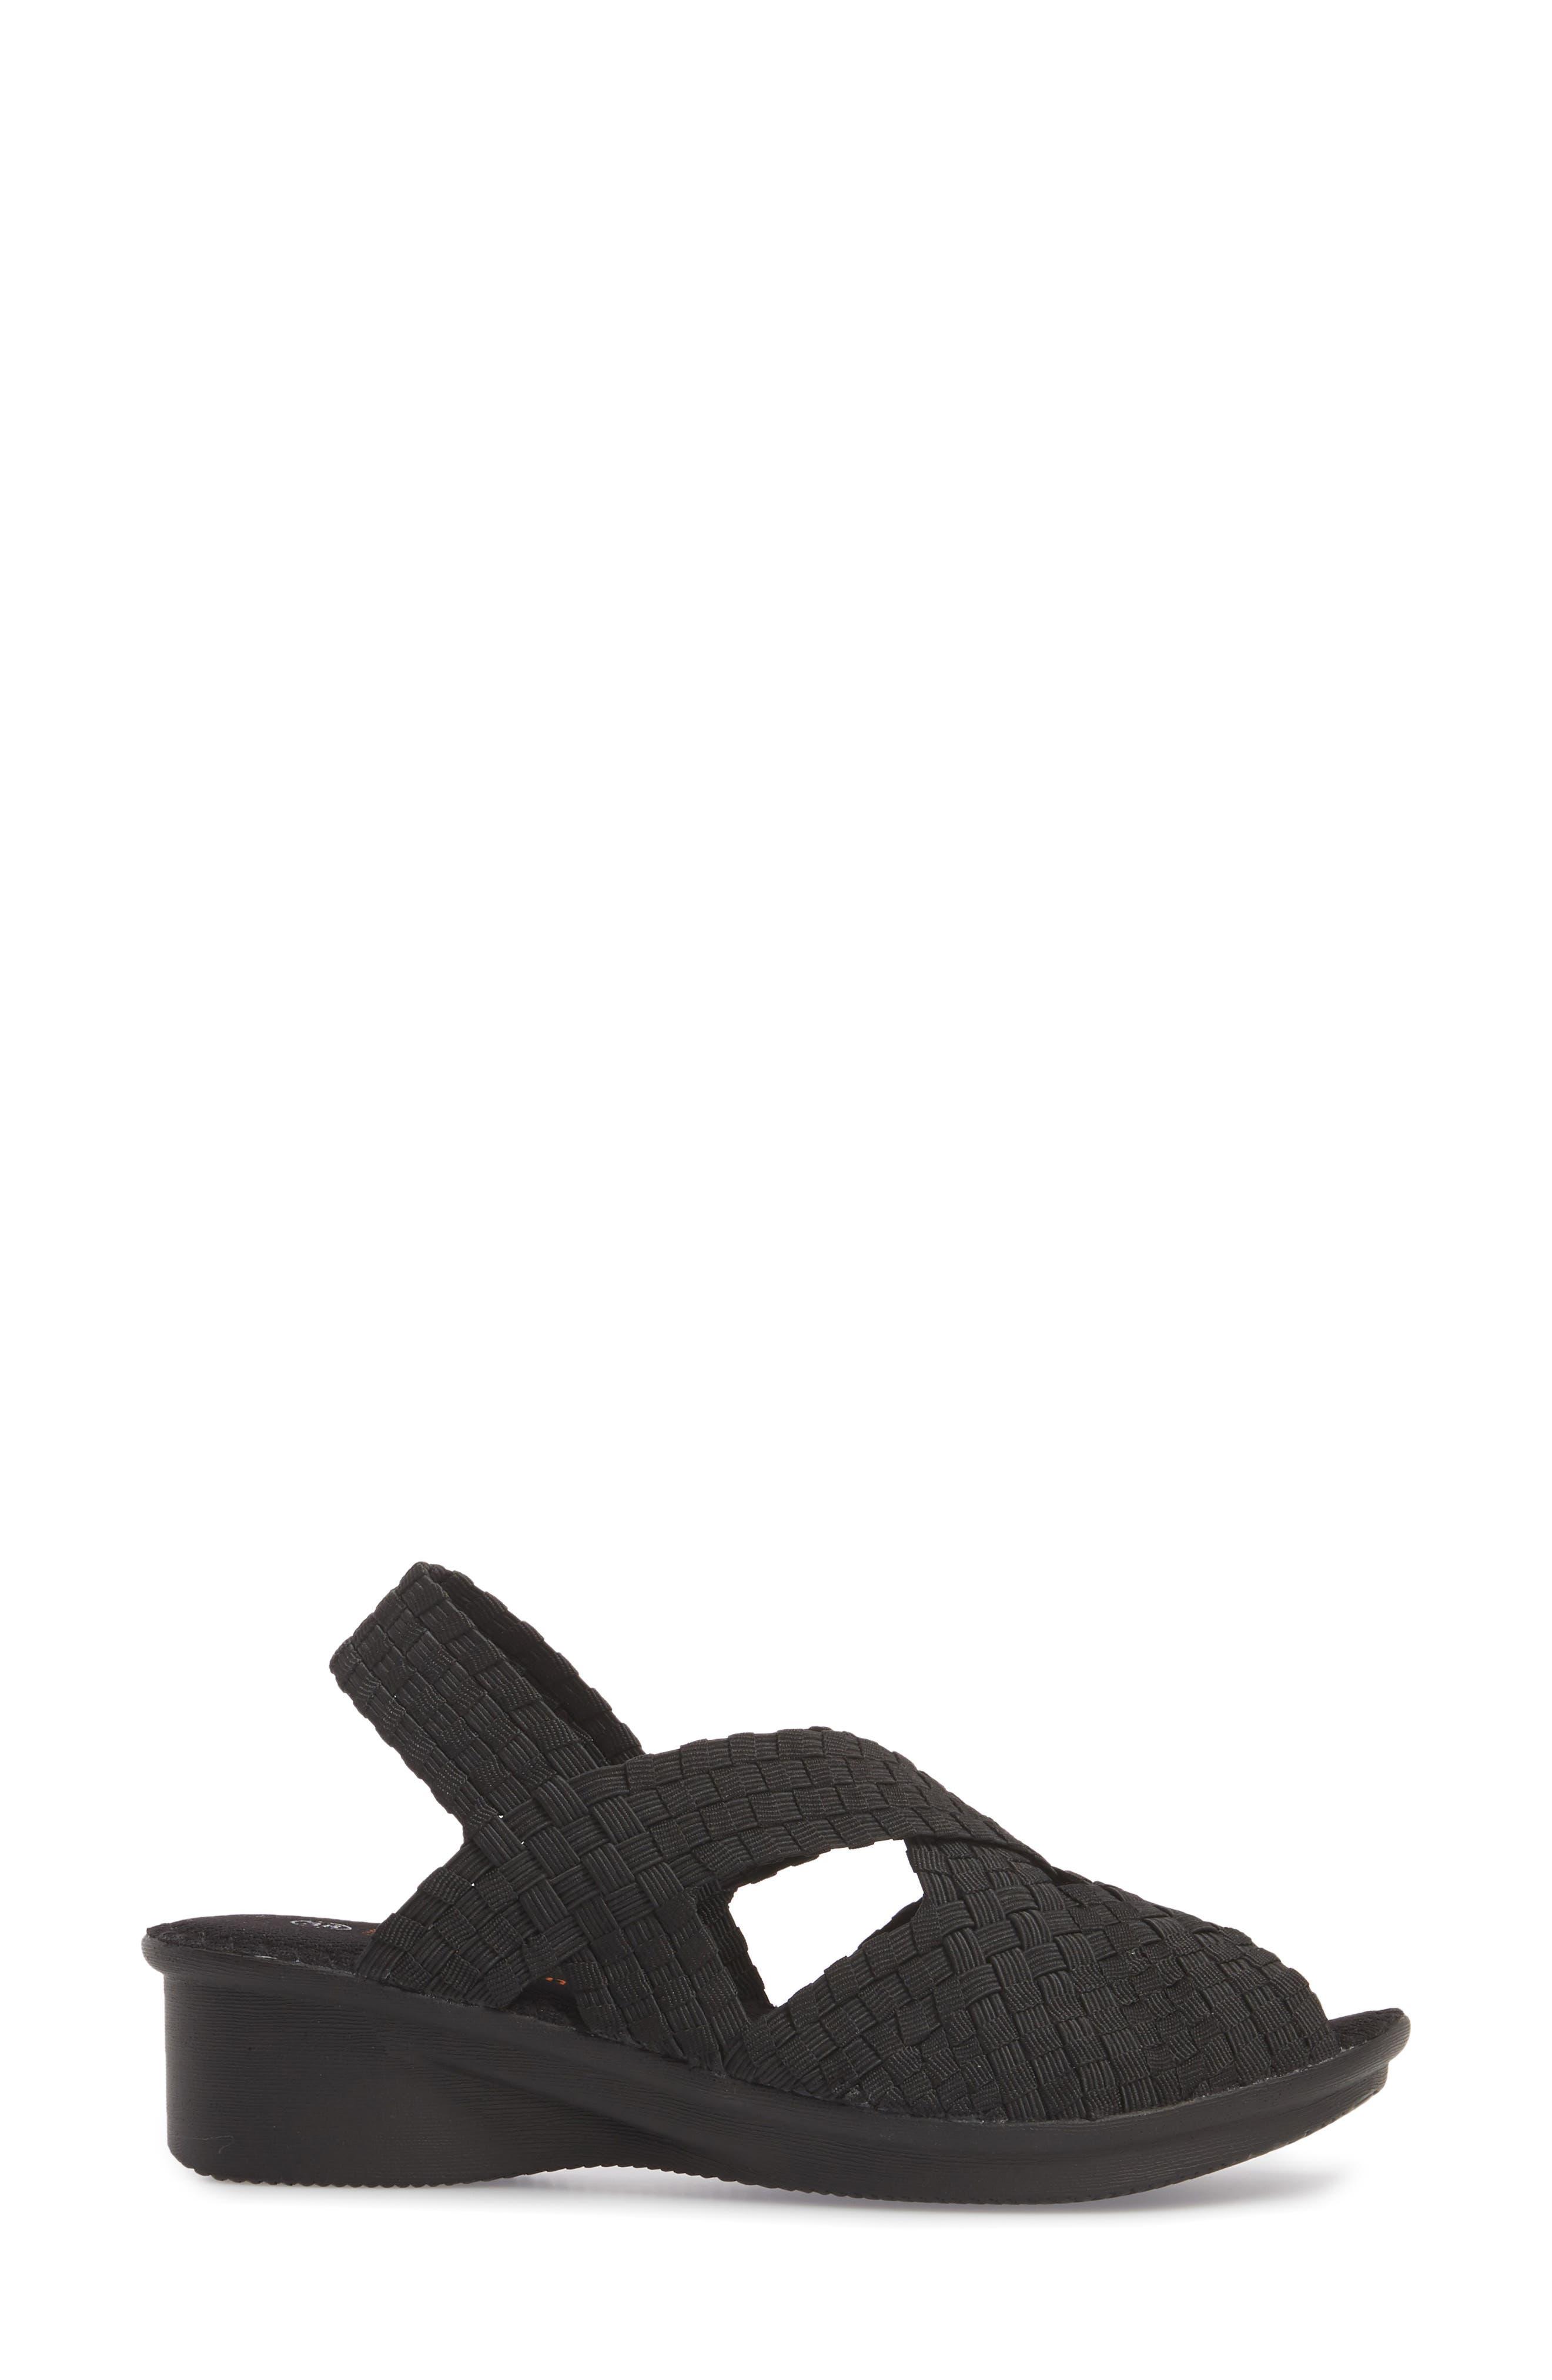 Kira Wedge Sandal,                             Alternate thumbnail 3, color,                             BLACK FABRIC